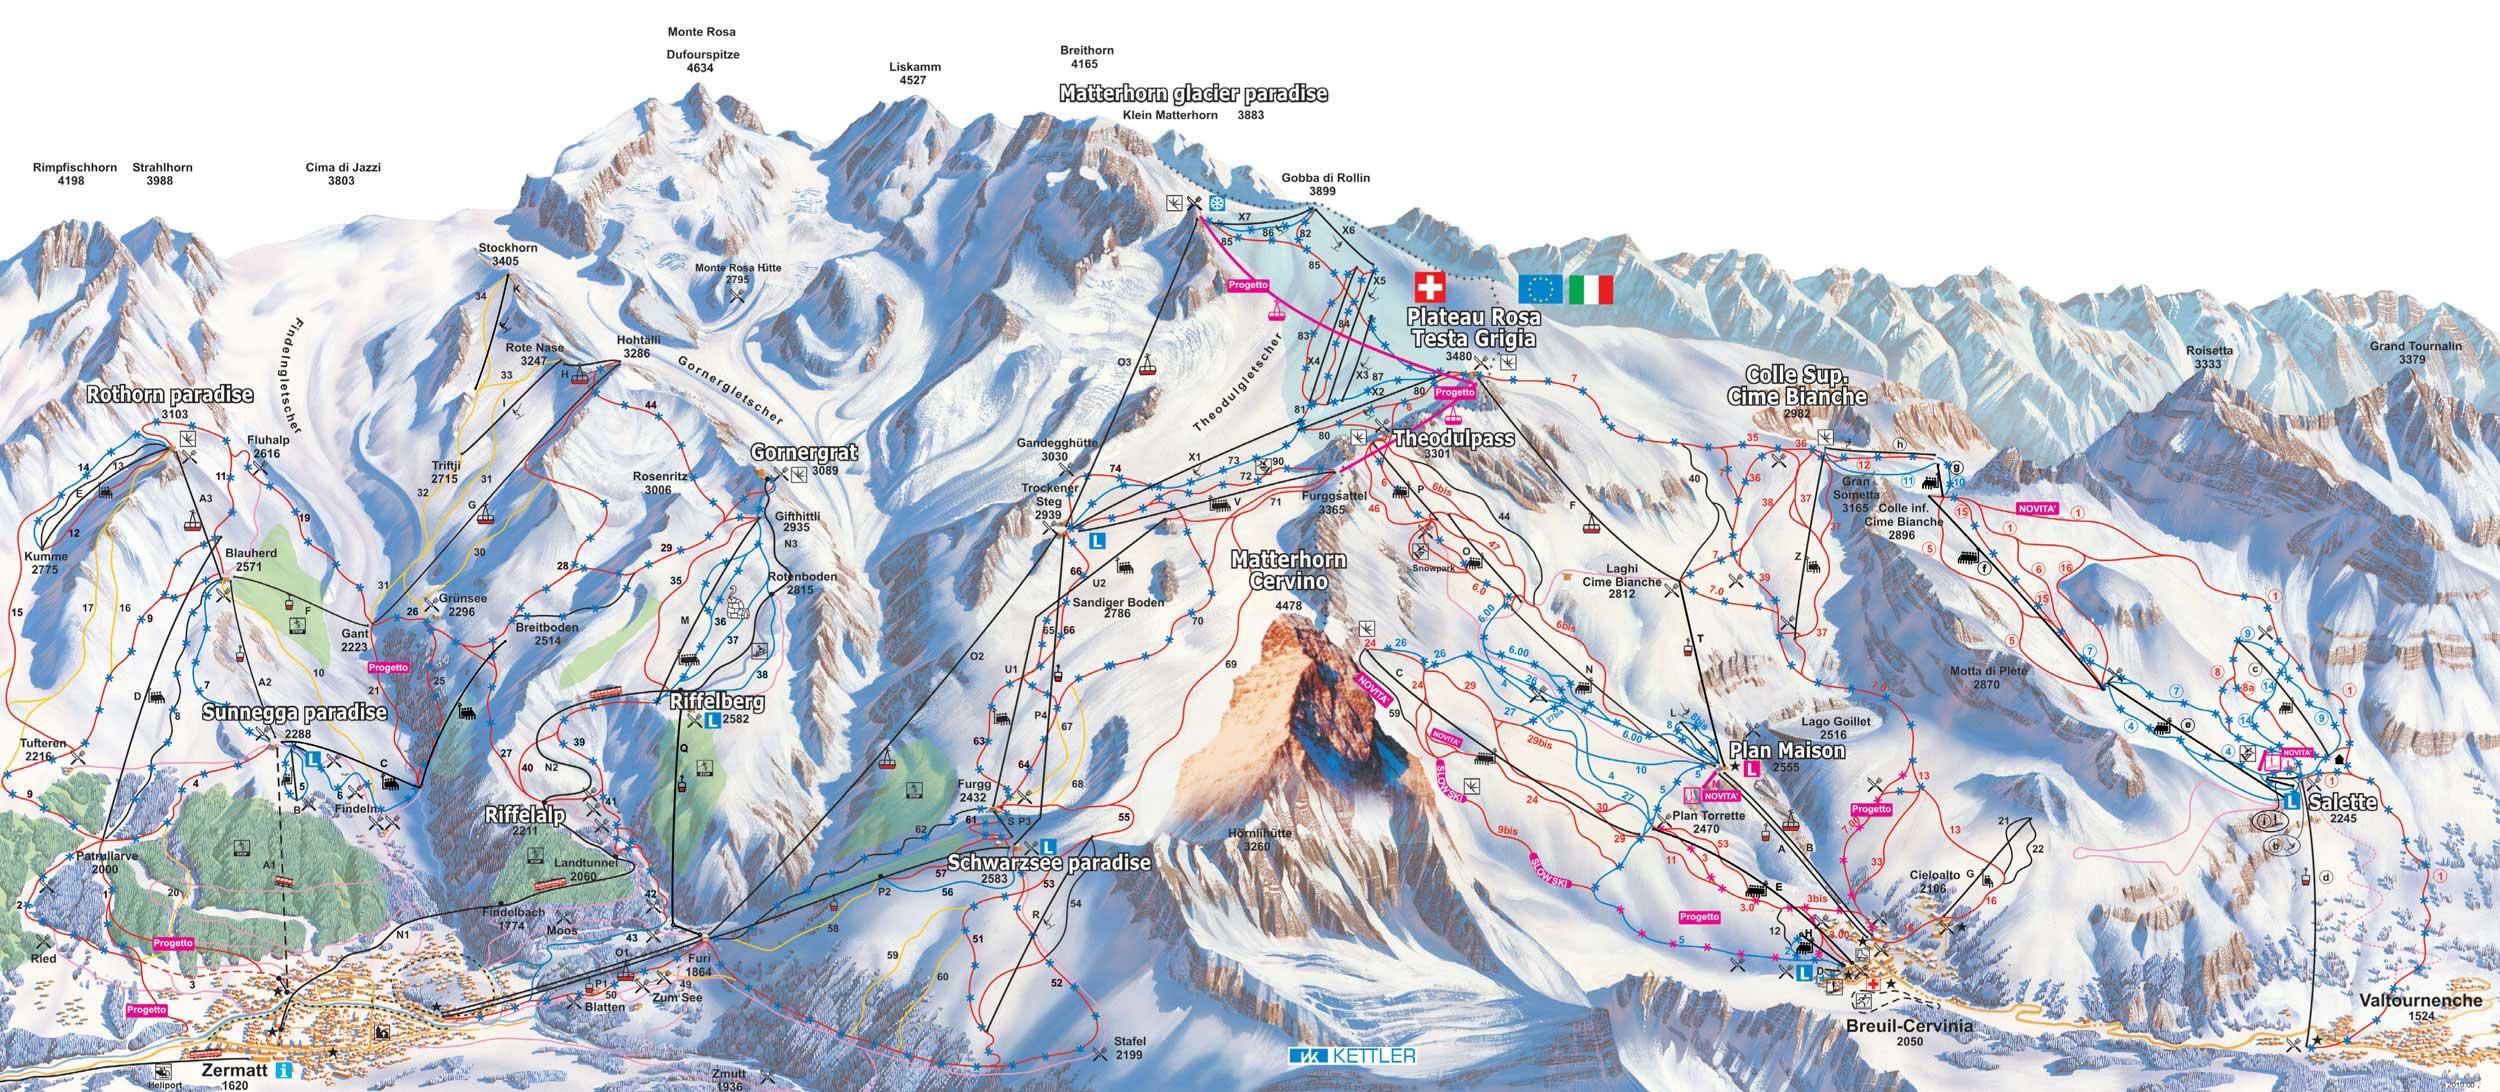 Cervinia Piste Map Ski map Breuil Cervinia (Italy)